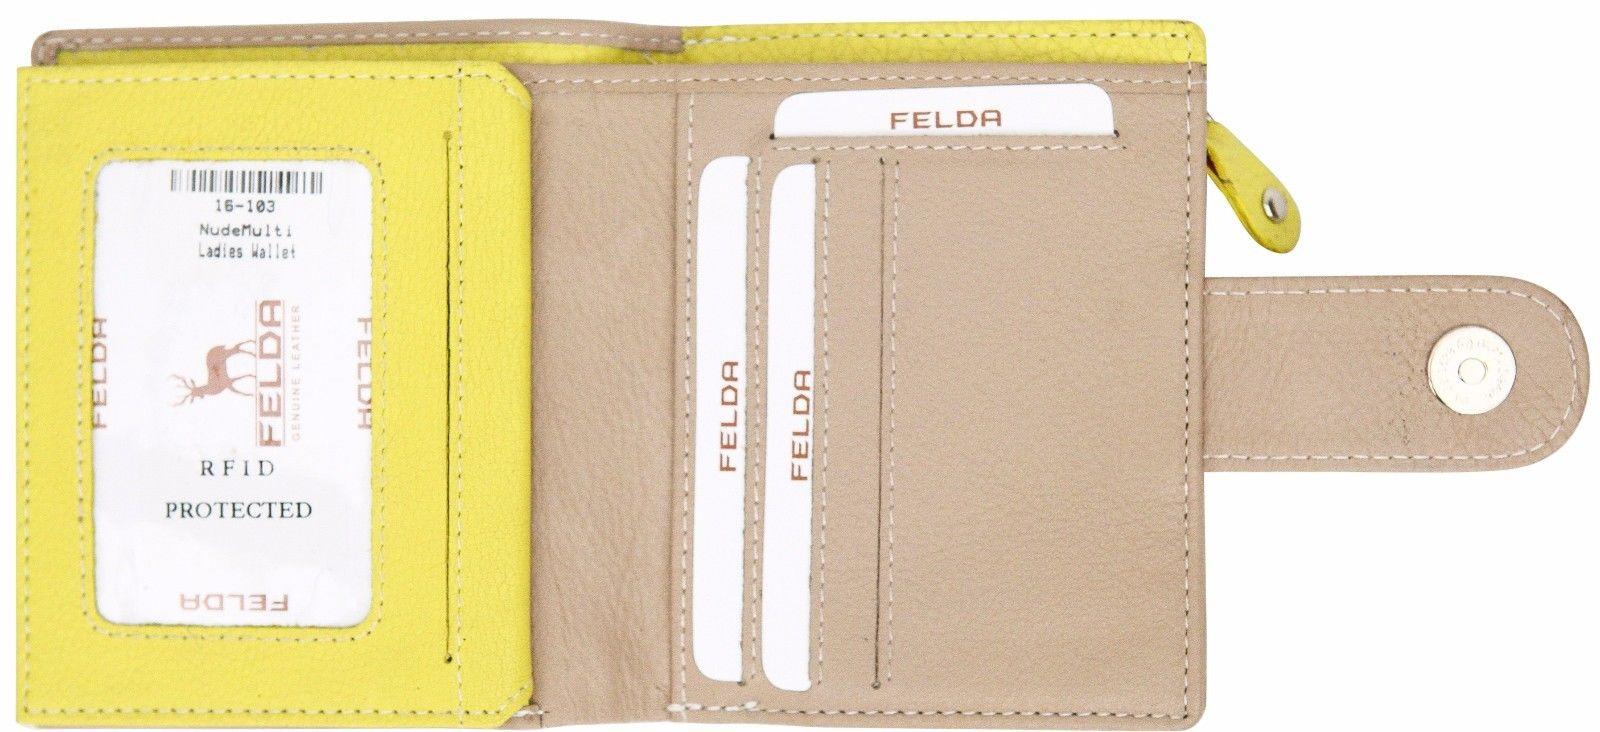 Felda-RFID-onorevoli-MEDAGLIA-amp-Card-Purse-Wallet-Genuine-Leather-Multi-SOFT-BOX-REGALO miniatura 63